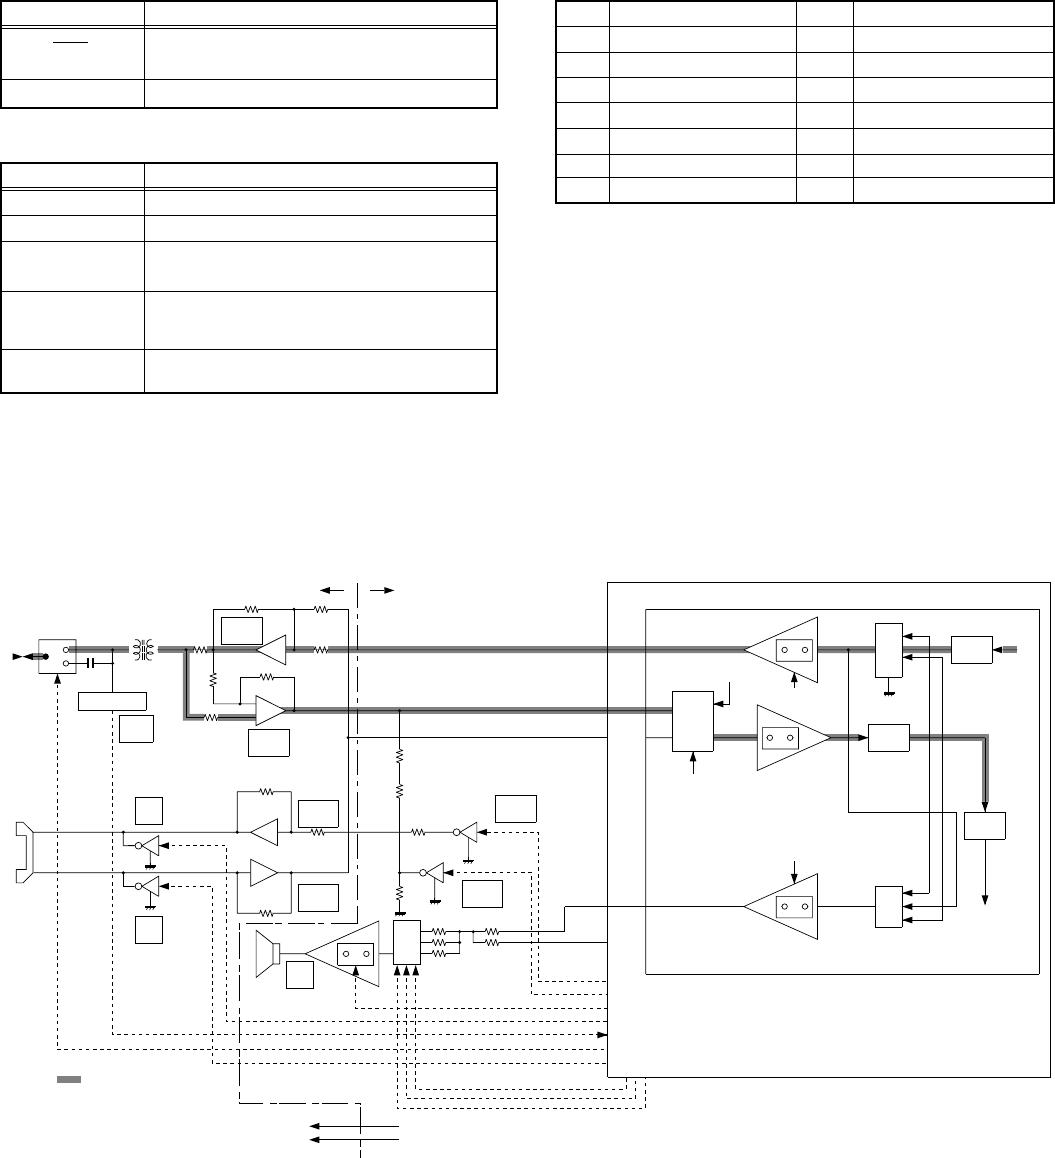 UXA260 R Ge Ecm Motor Wiring Diagram on